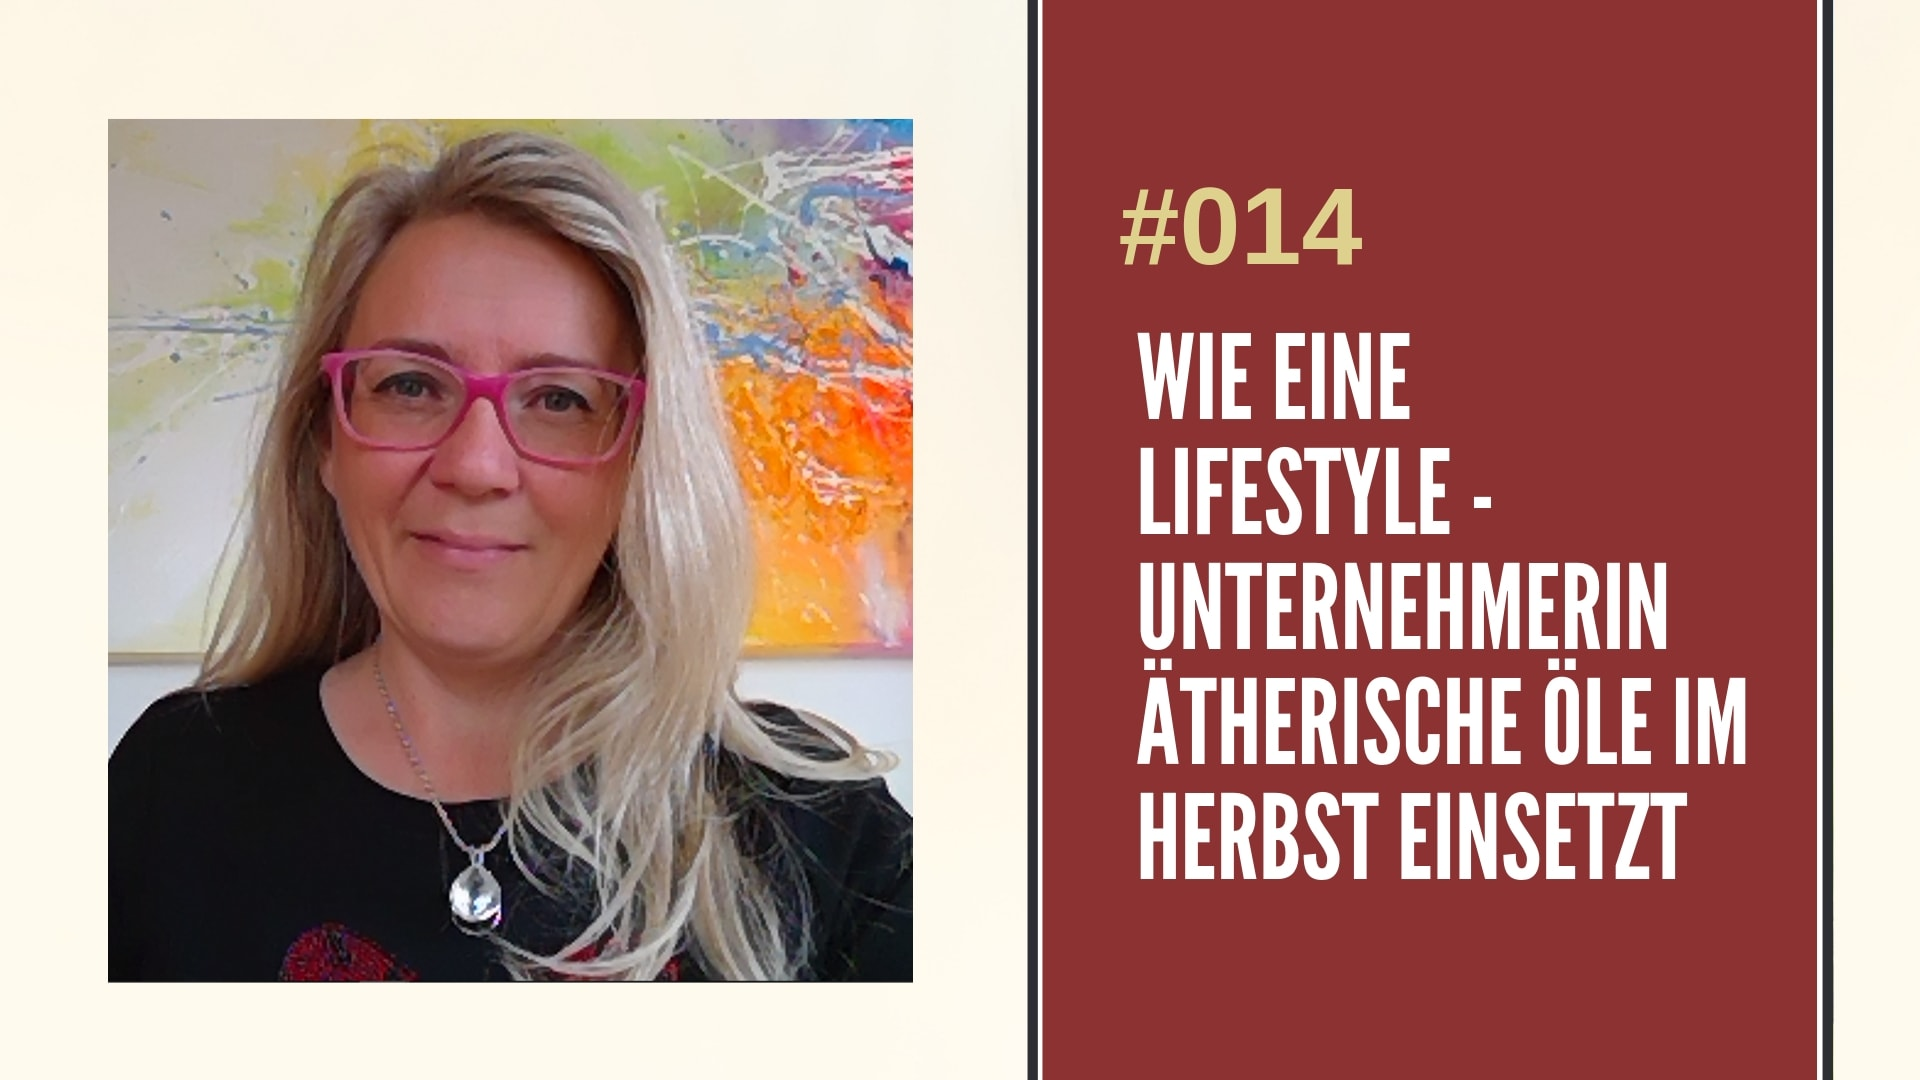 ätherische Öle Herbst Lifestyleunternehmerin Tanja Traupmann